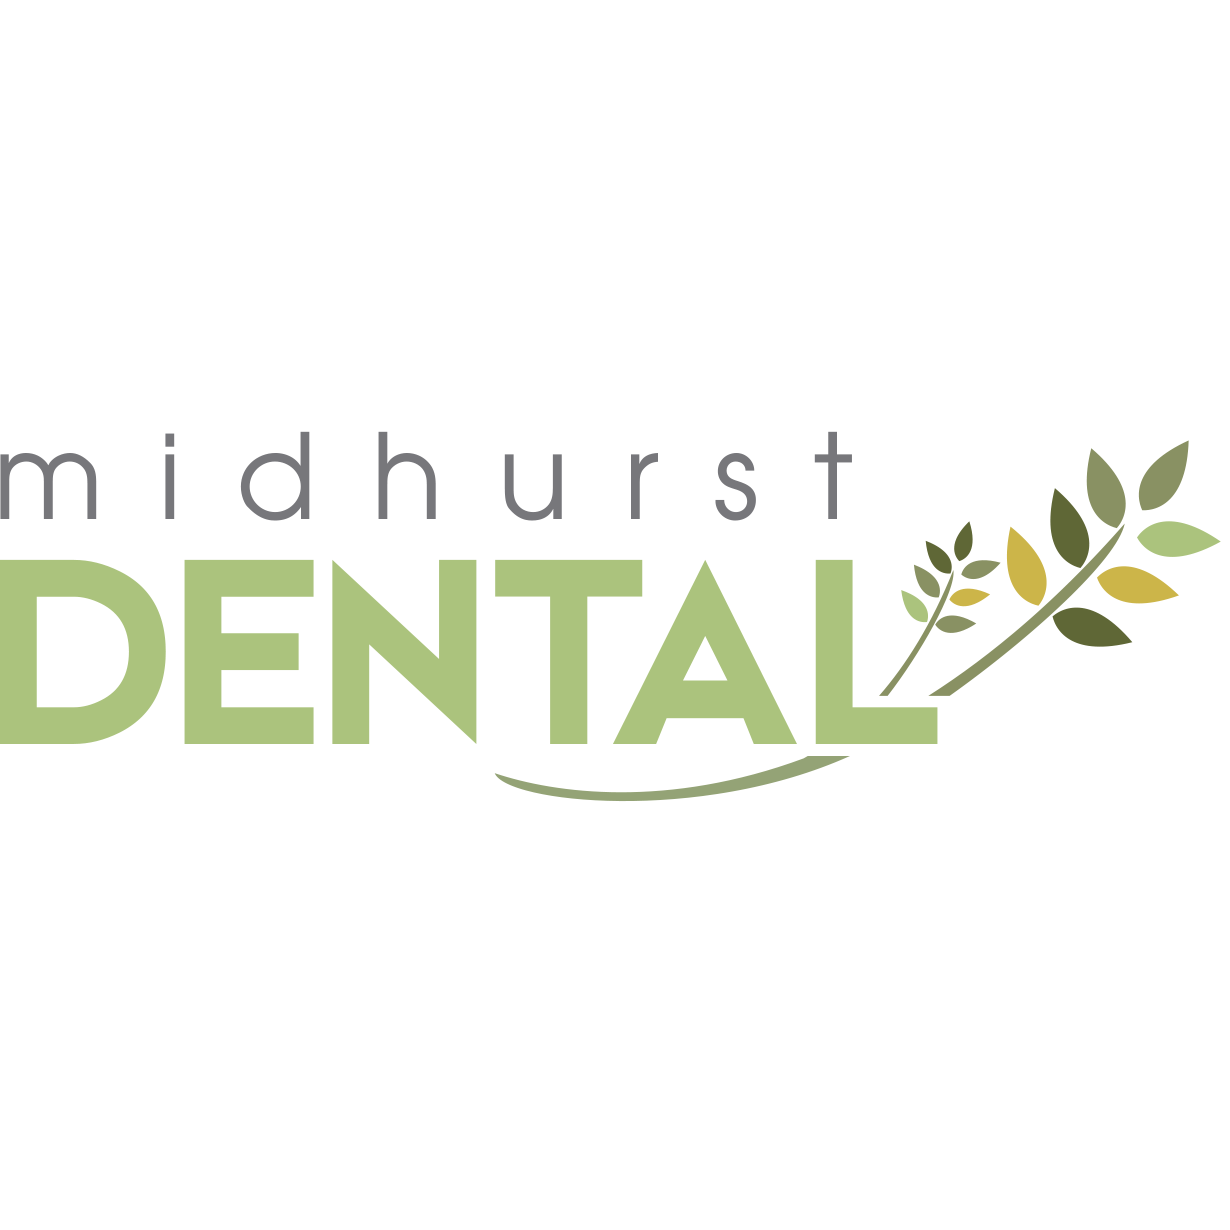 Midhurst Dental - Midhurst, ON L9X 0P2 - (705)721-1522 | ShowMeLocal.com